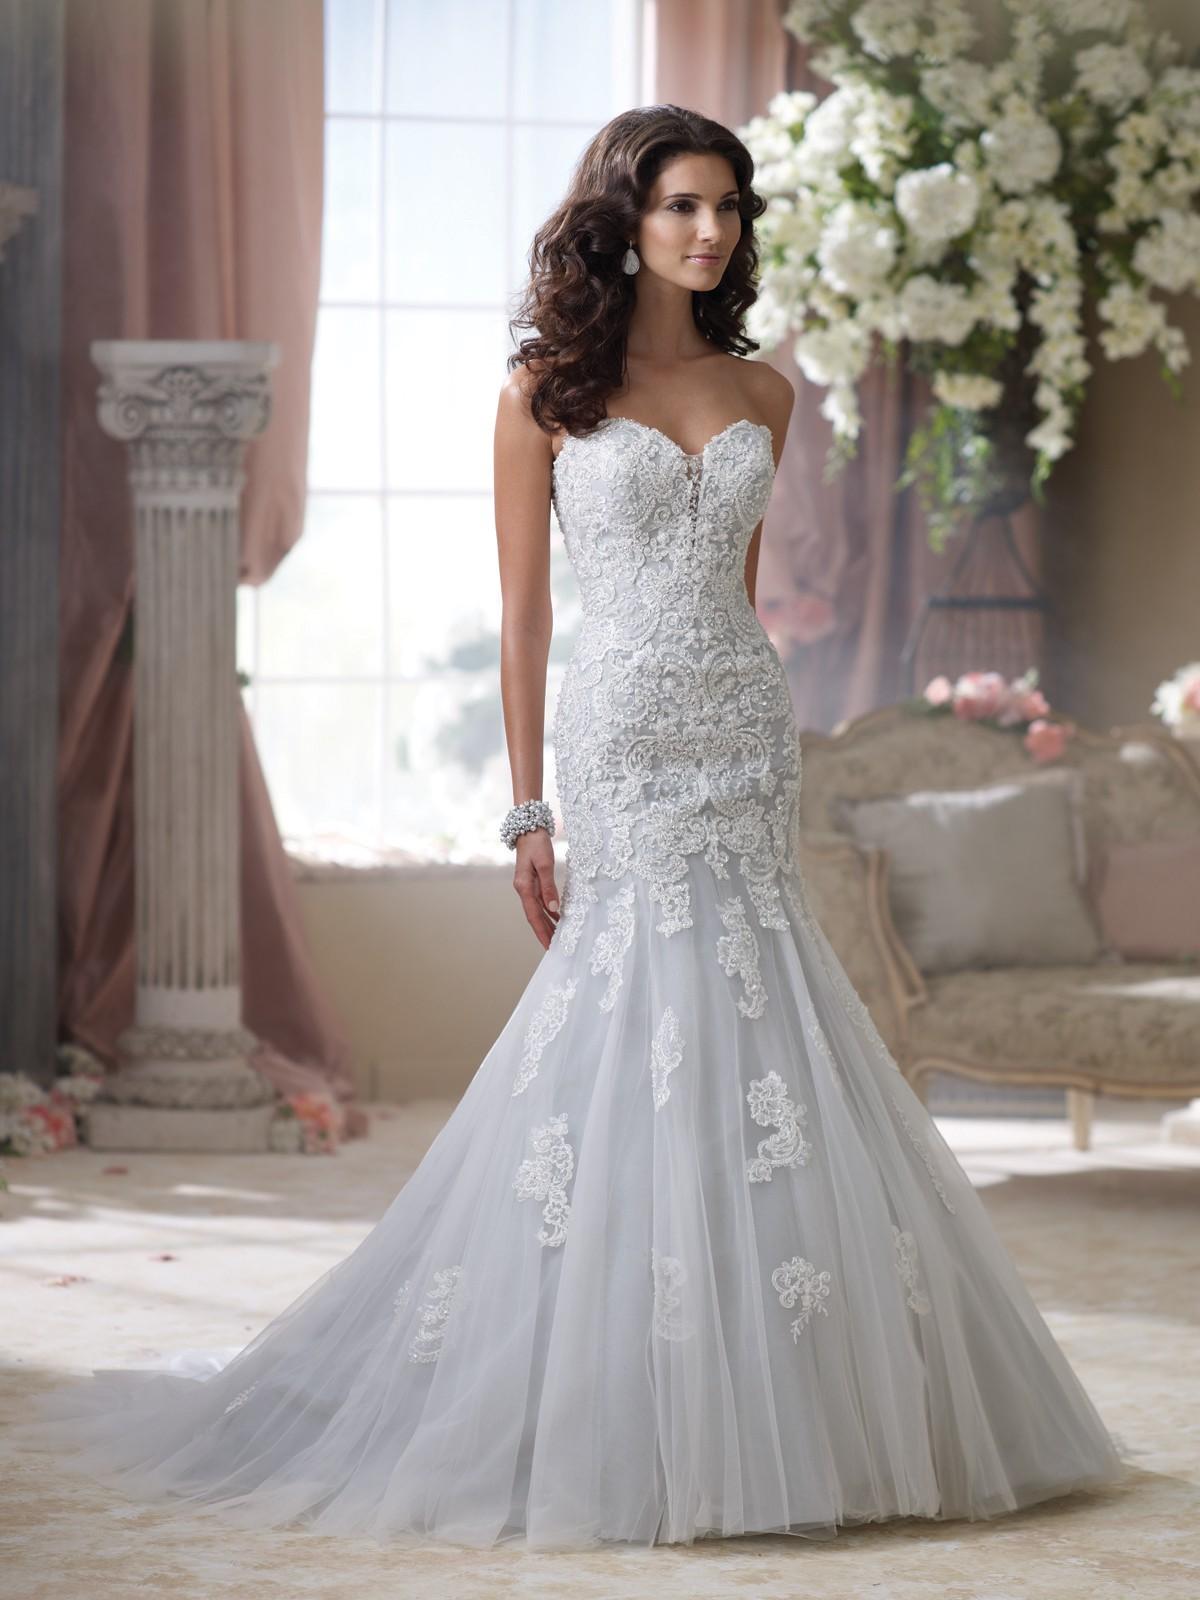 David Tutera Beryl 114293 New Wedding Dress Save 44 Stillwhite,Budget Wedding Dresses Brisbane